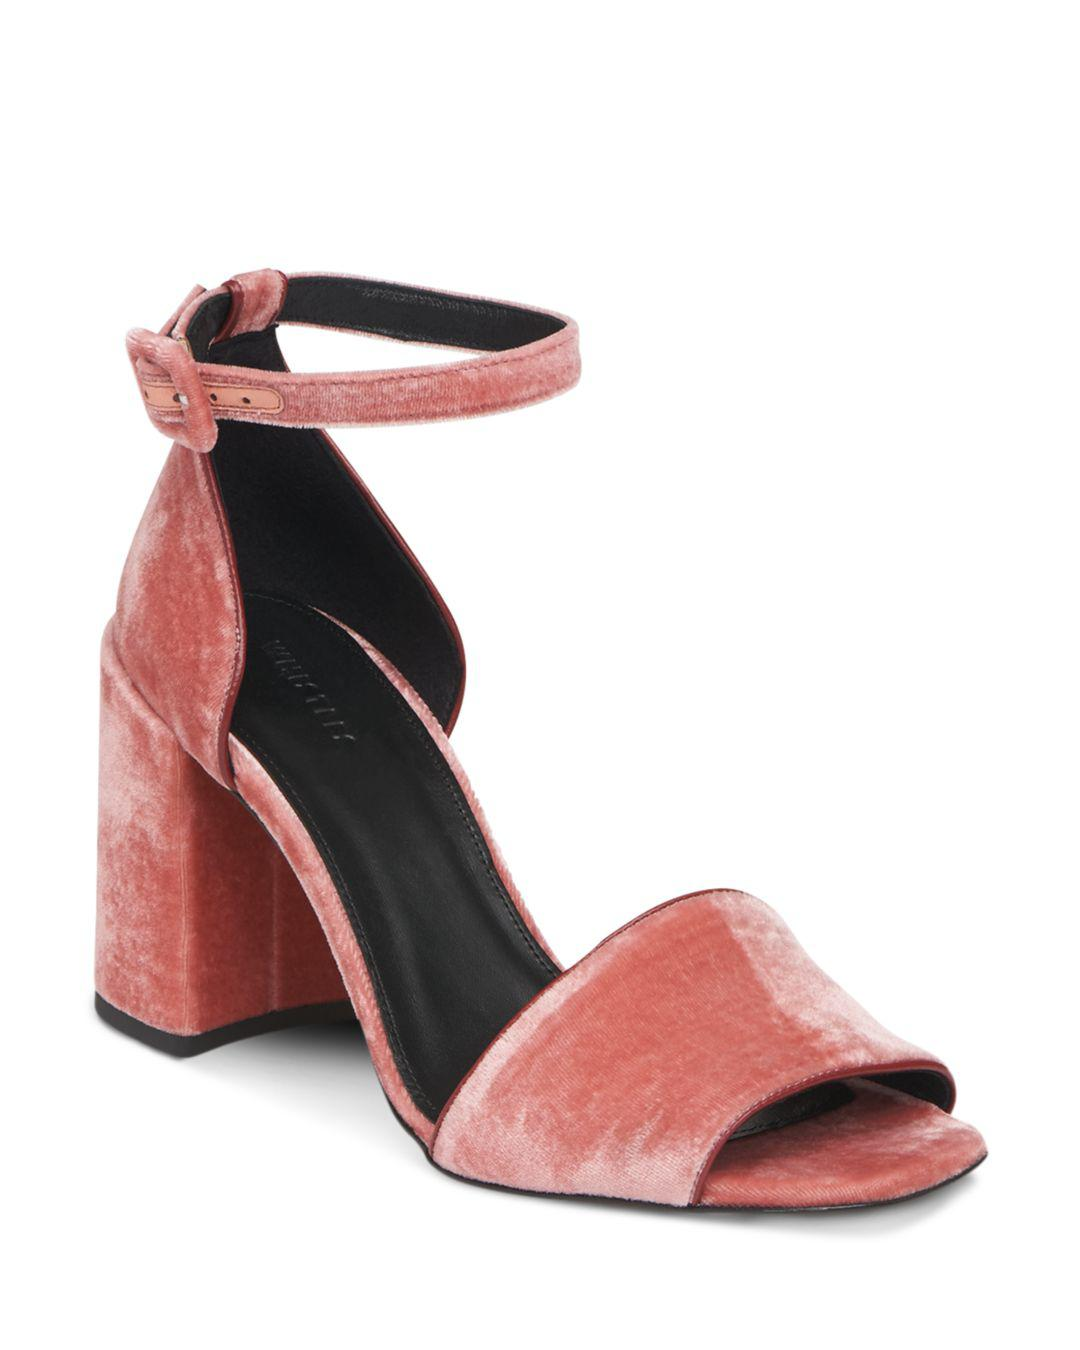 0d611ba807e Whistles Women s Hedda Velvet Block Heel Sandals in Pink - Lyst